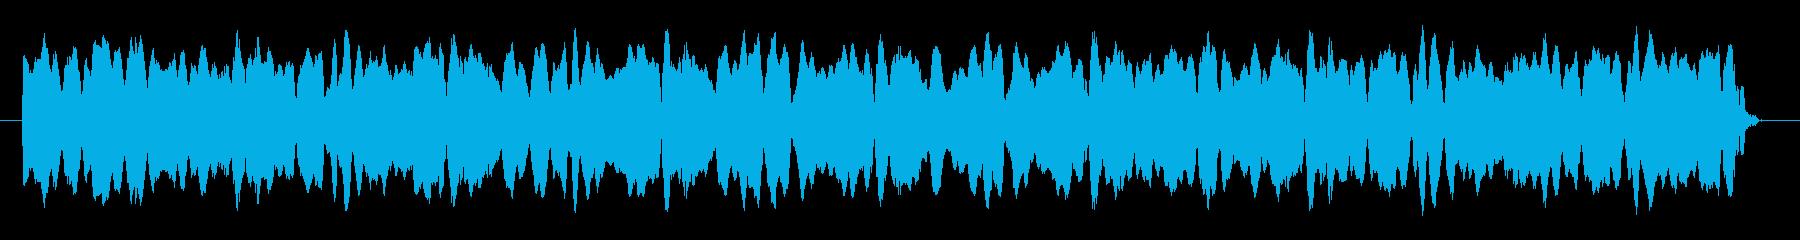 8bitパワーU-D-02-4_dryの再生済みの波形